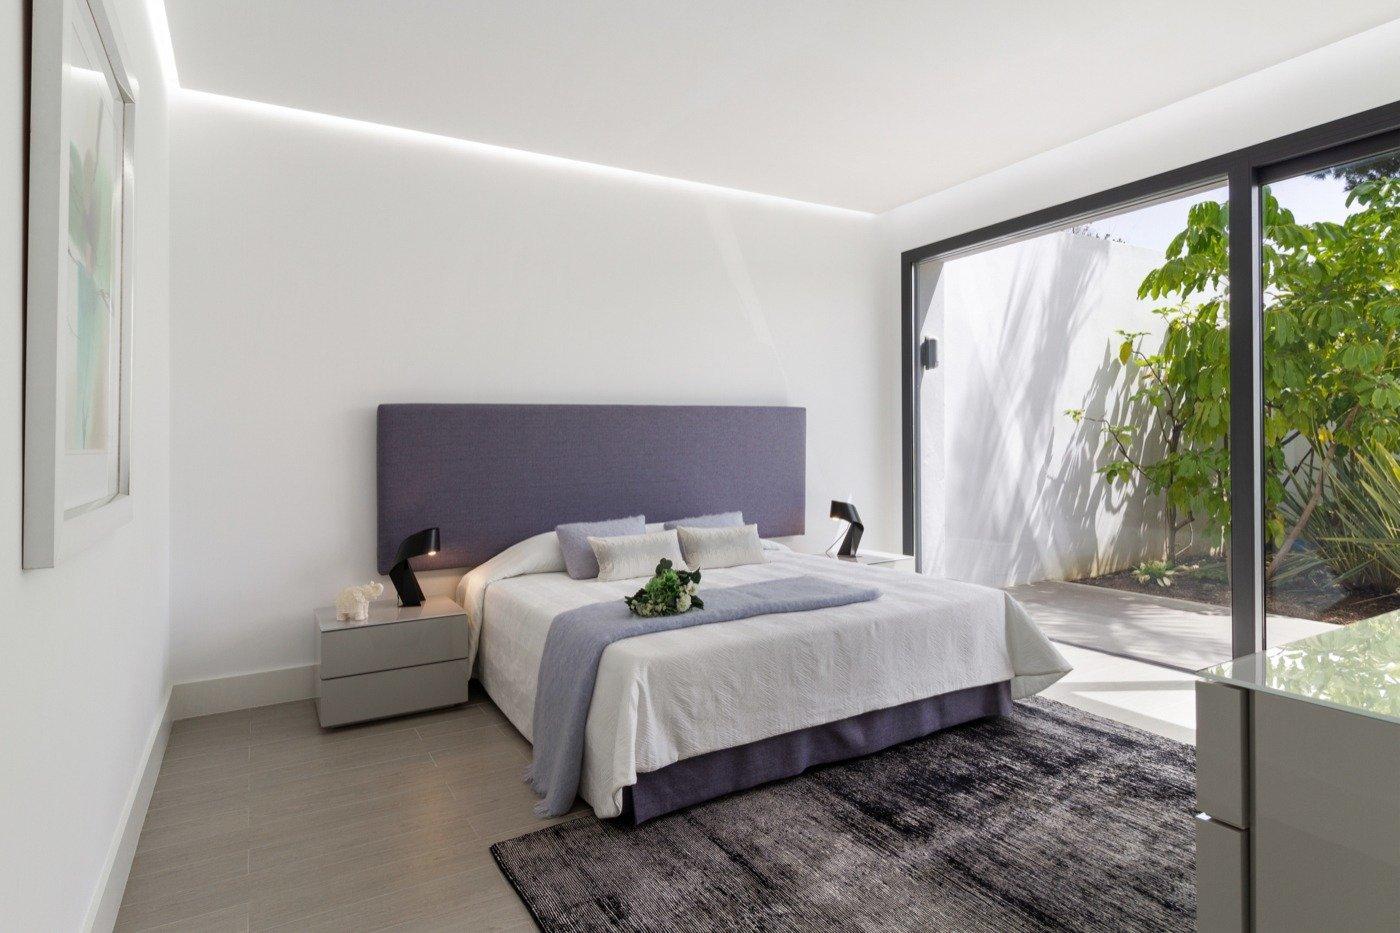 BRAND NEW EXCEPTIONAL CONTEMPORARY VILLA, LA RESERVA DE ALCUZCUZ, BENAHAVIS